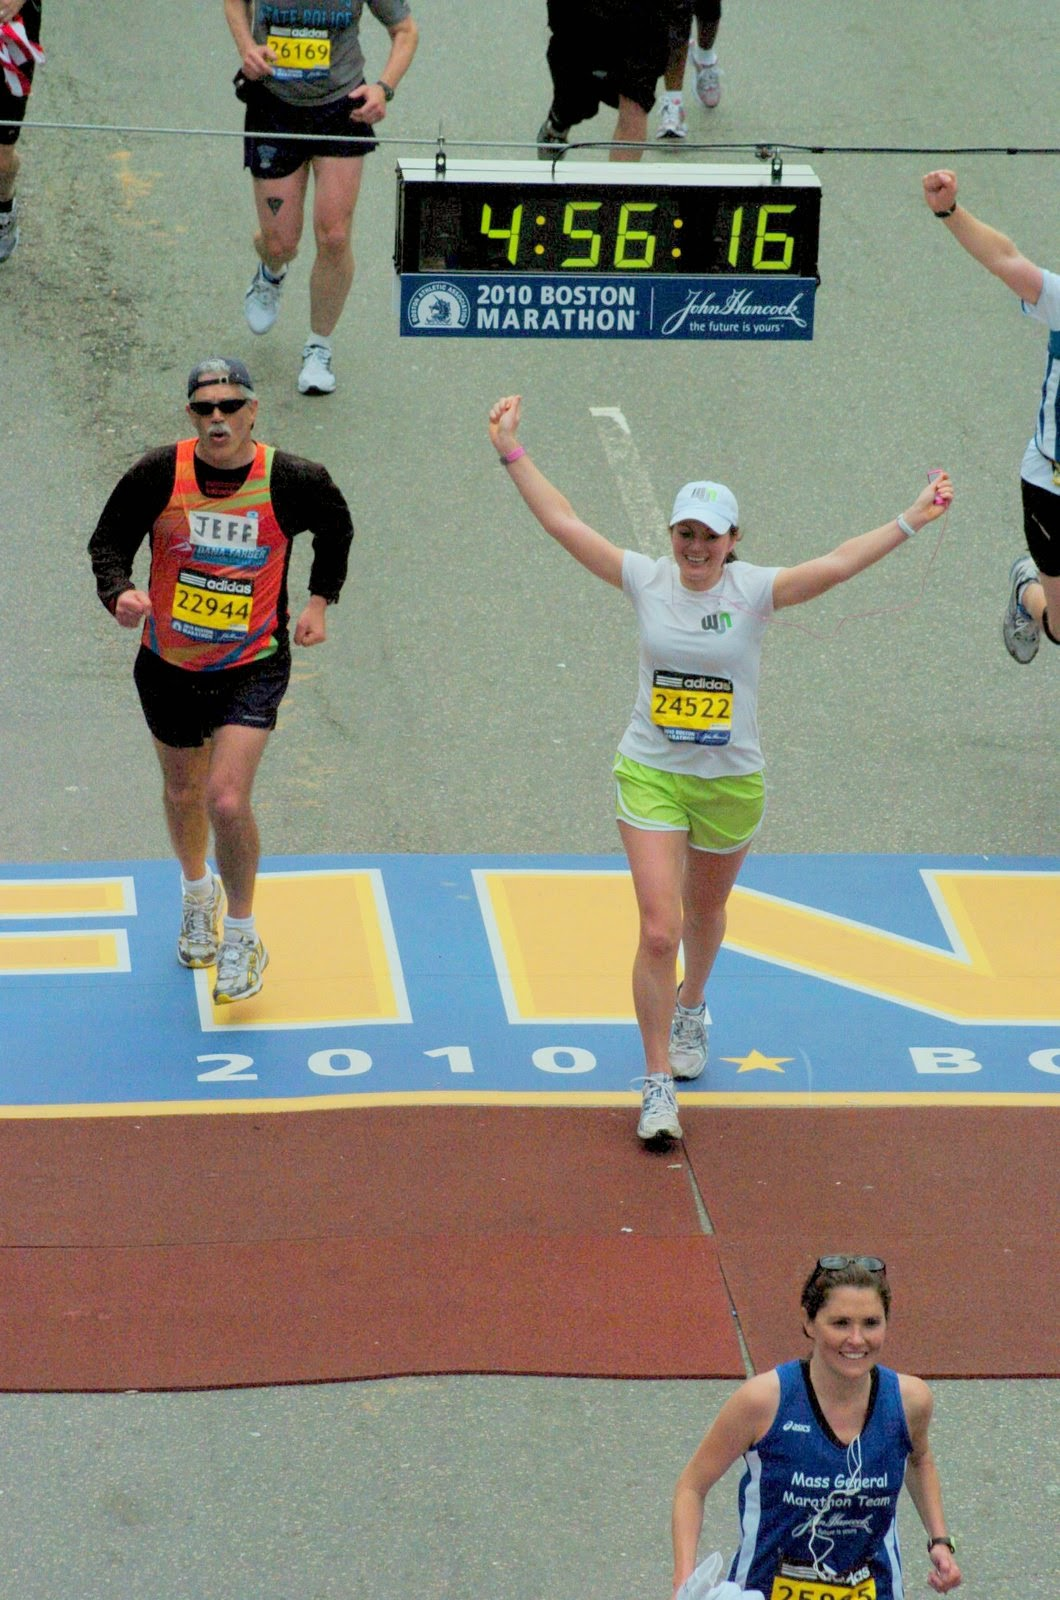 Julie Flygare finishing the Boston Marathon.